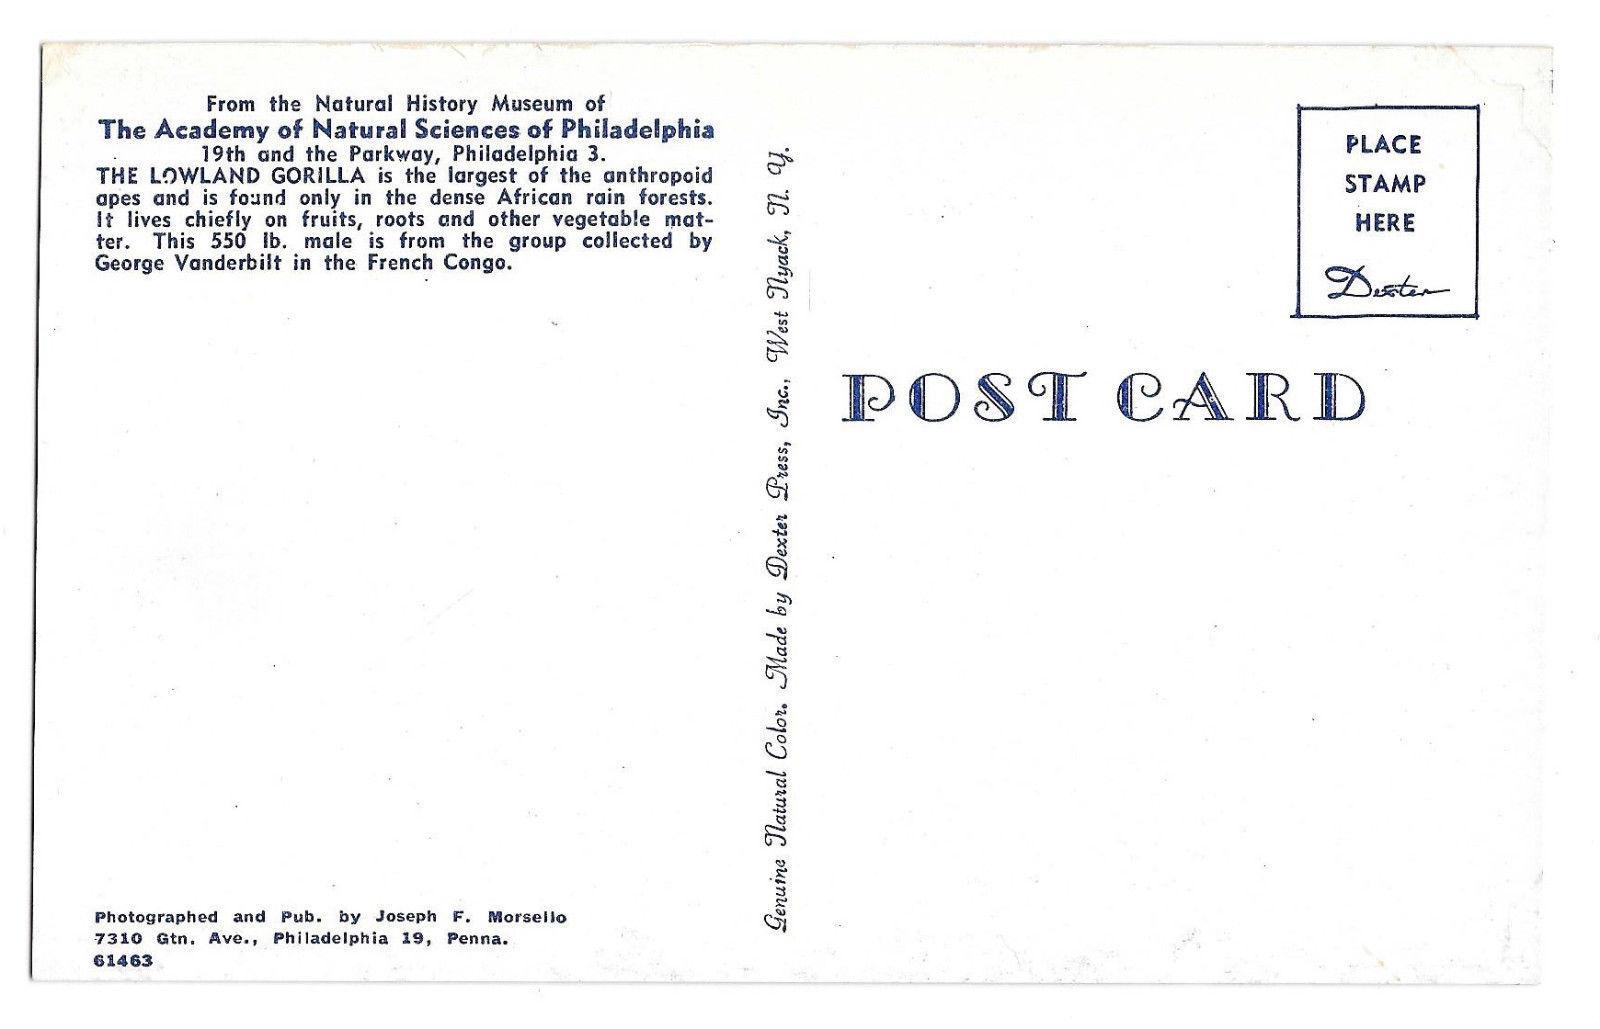 Lowland Gorilla Philadelphia Academy Natural Science Museum Exhibit Postcard